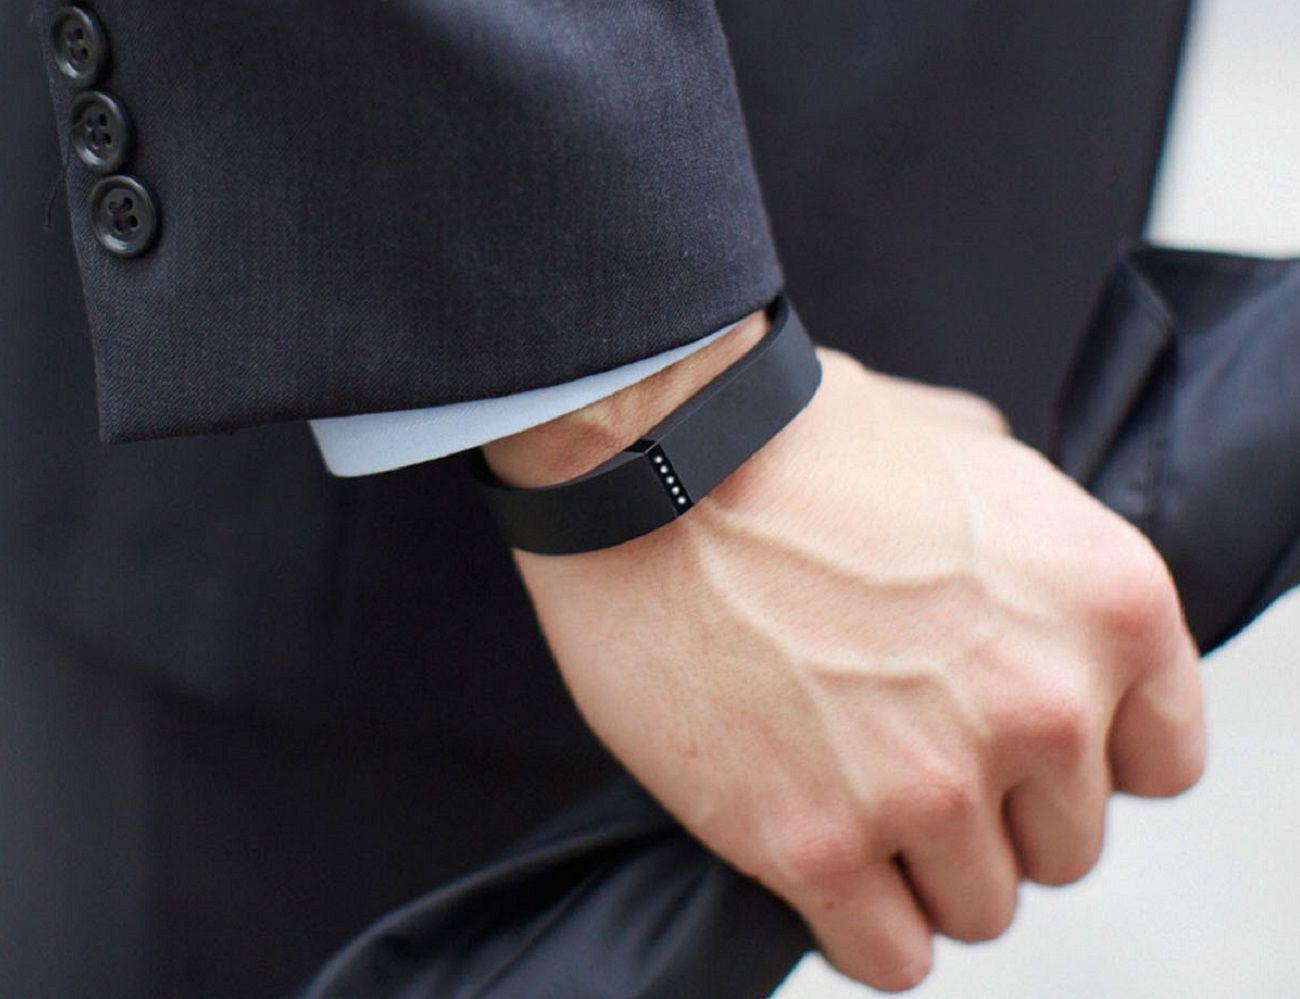 Fitbit Flex Monitoring Wristband